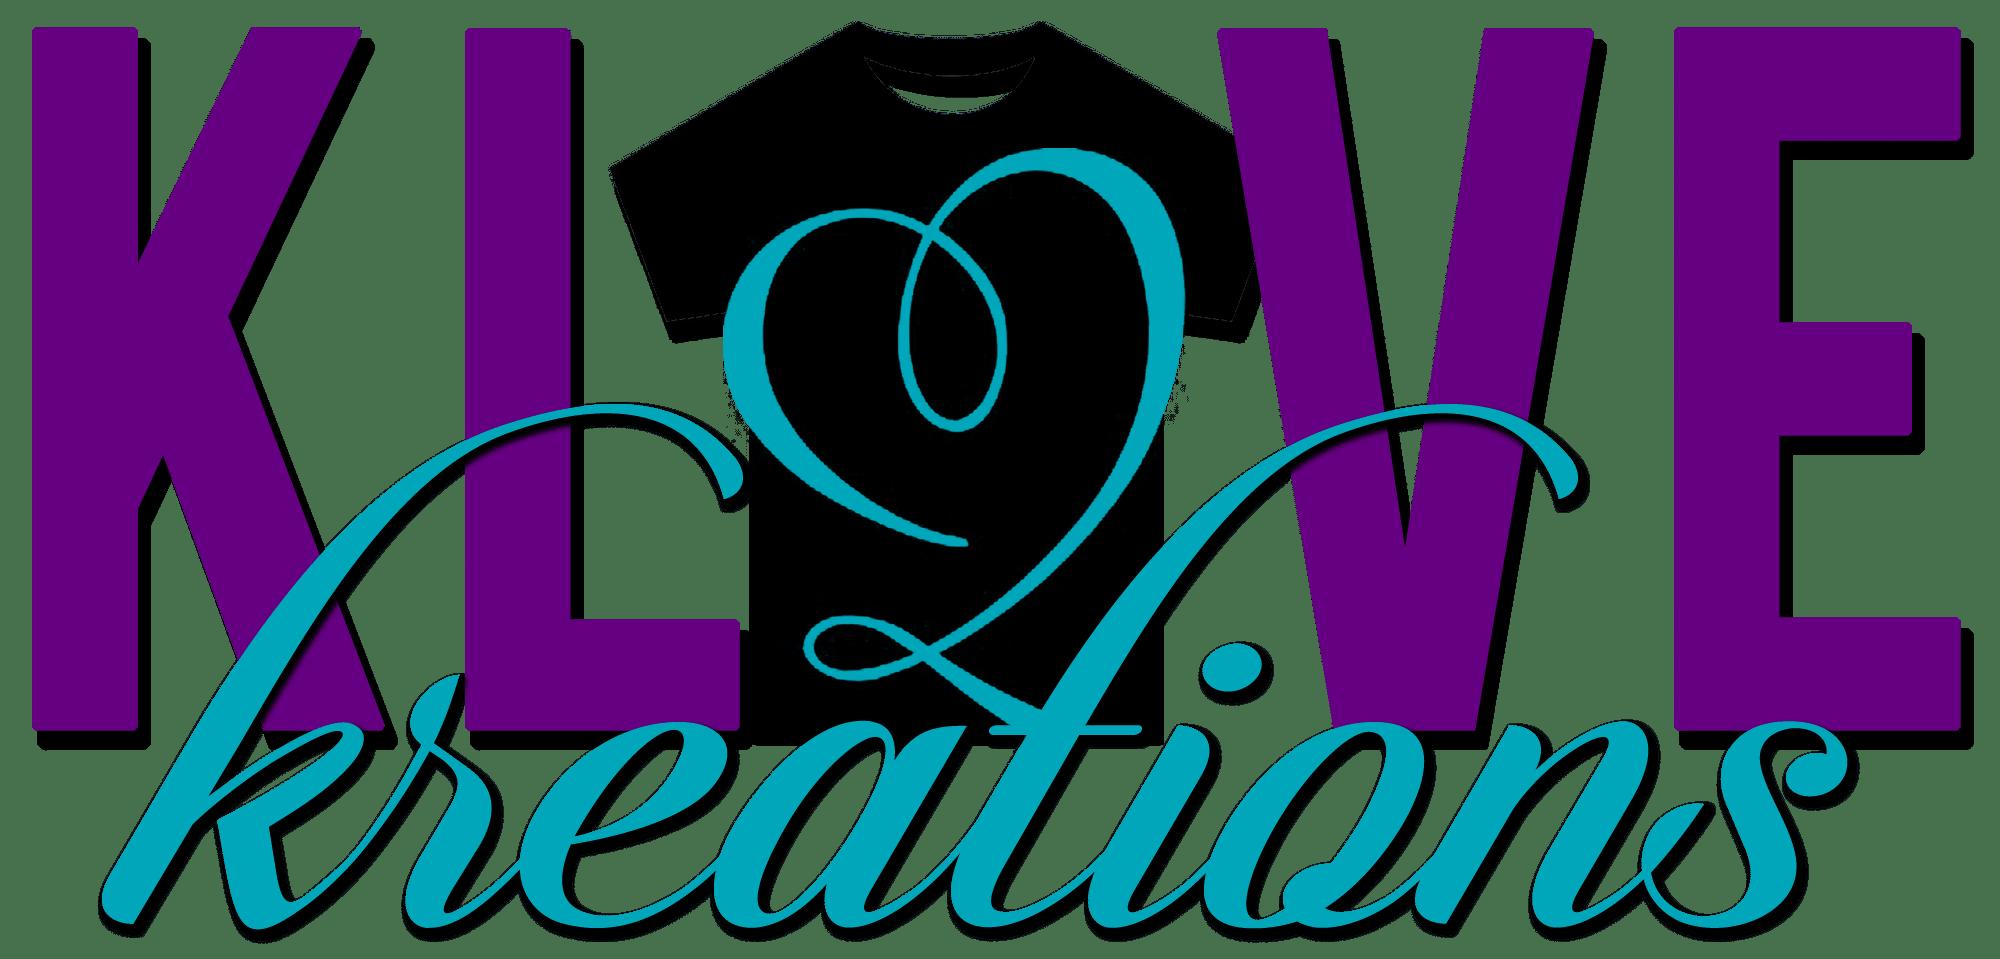 KLove Kreations - Custom T-Shirts